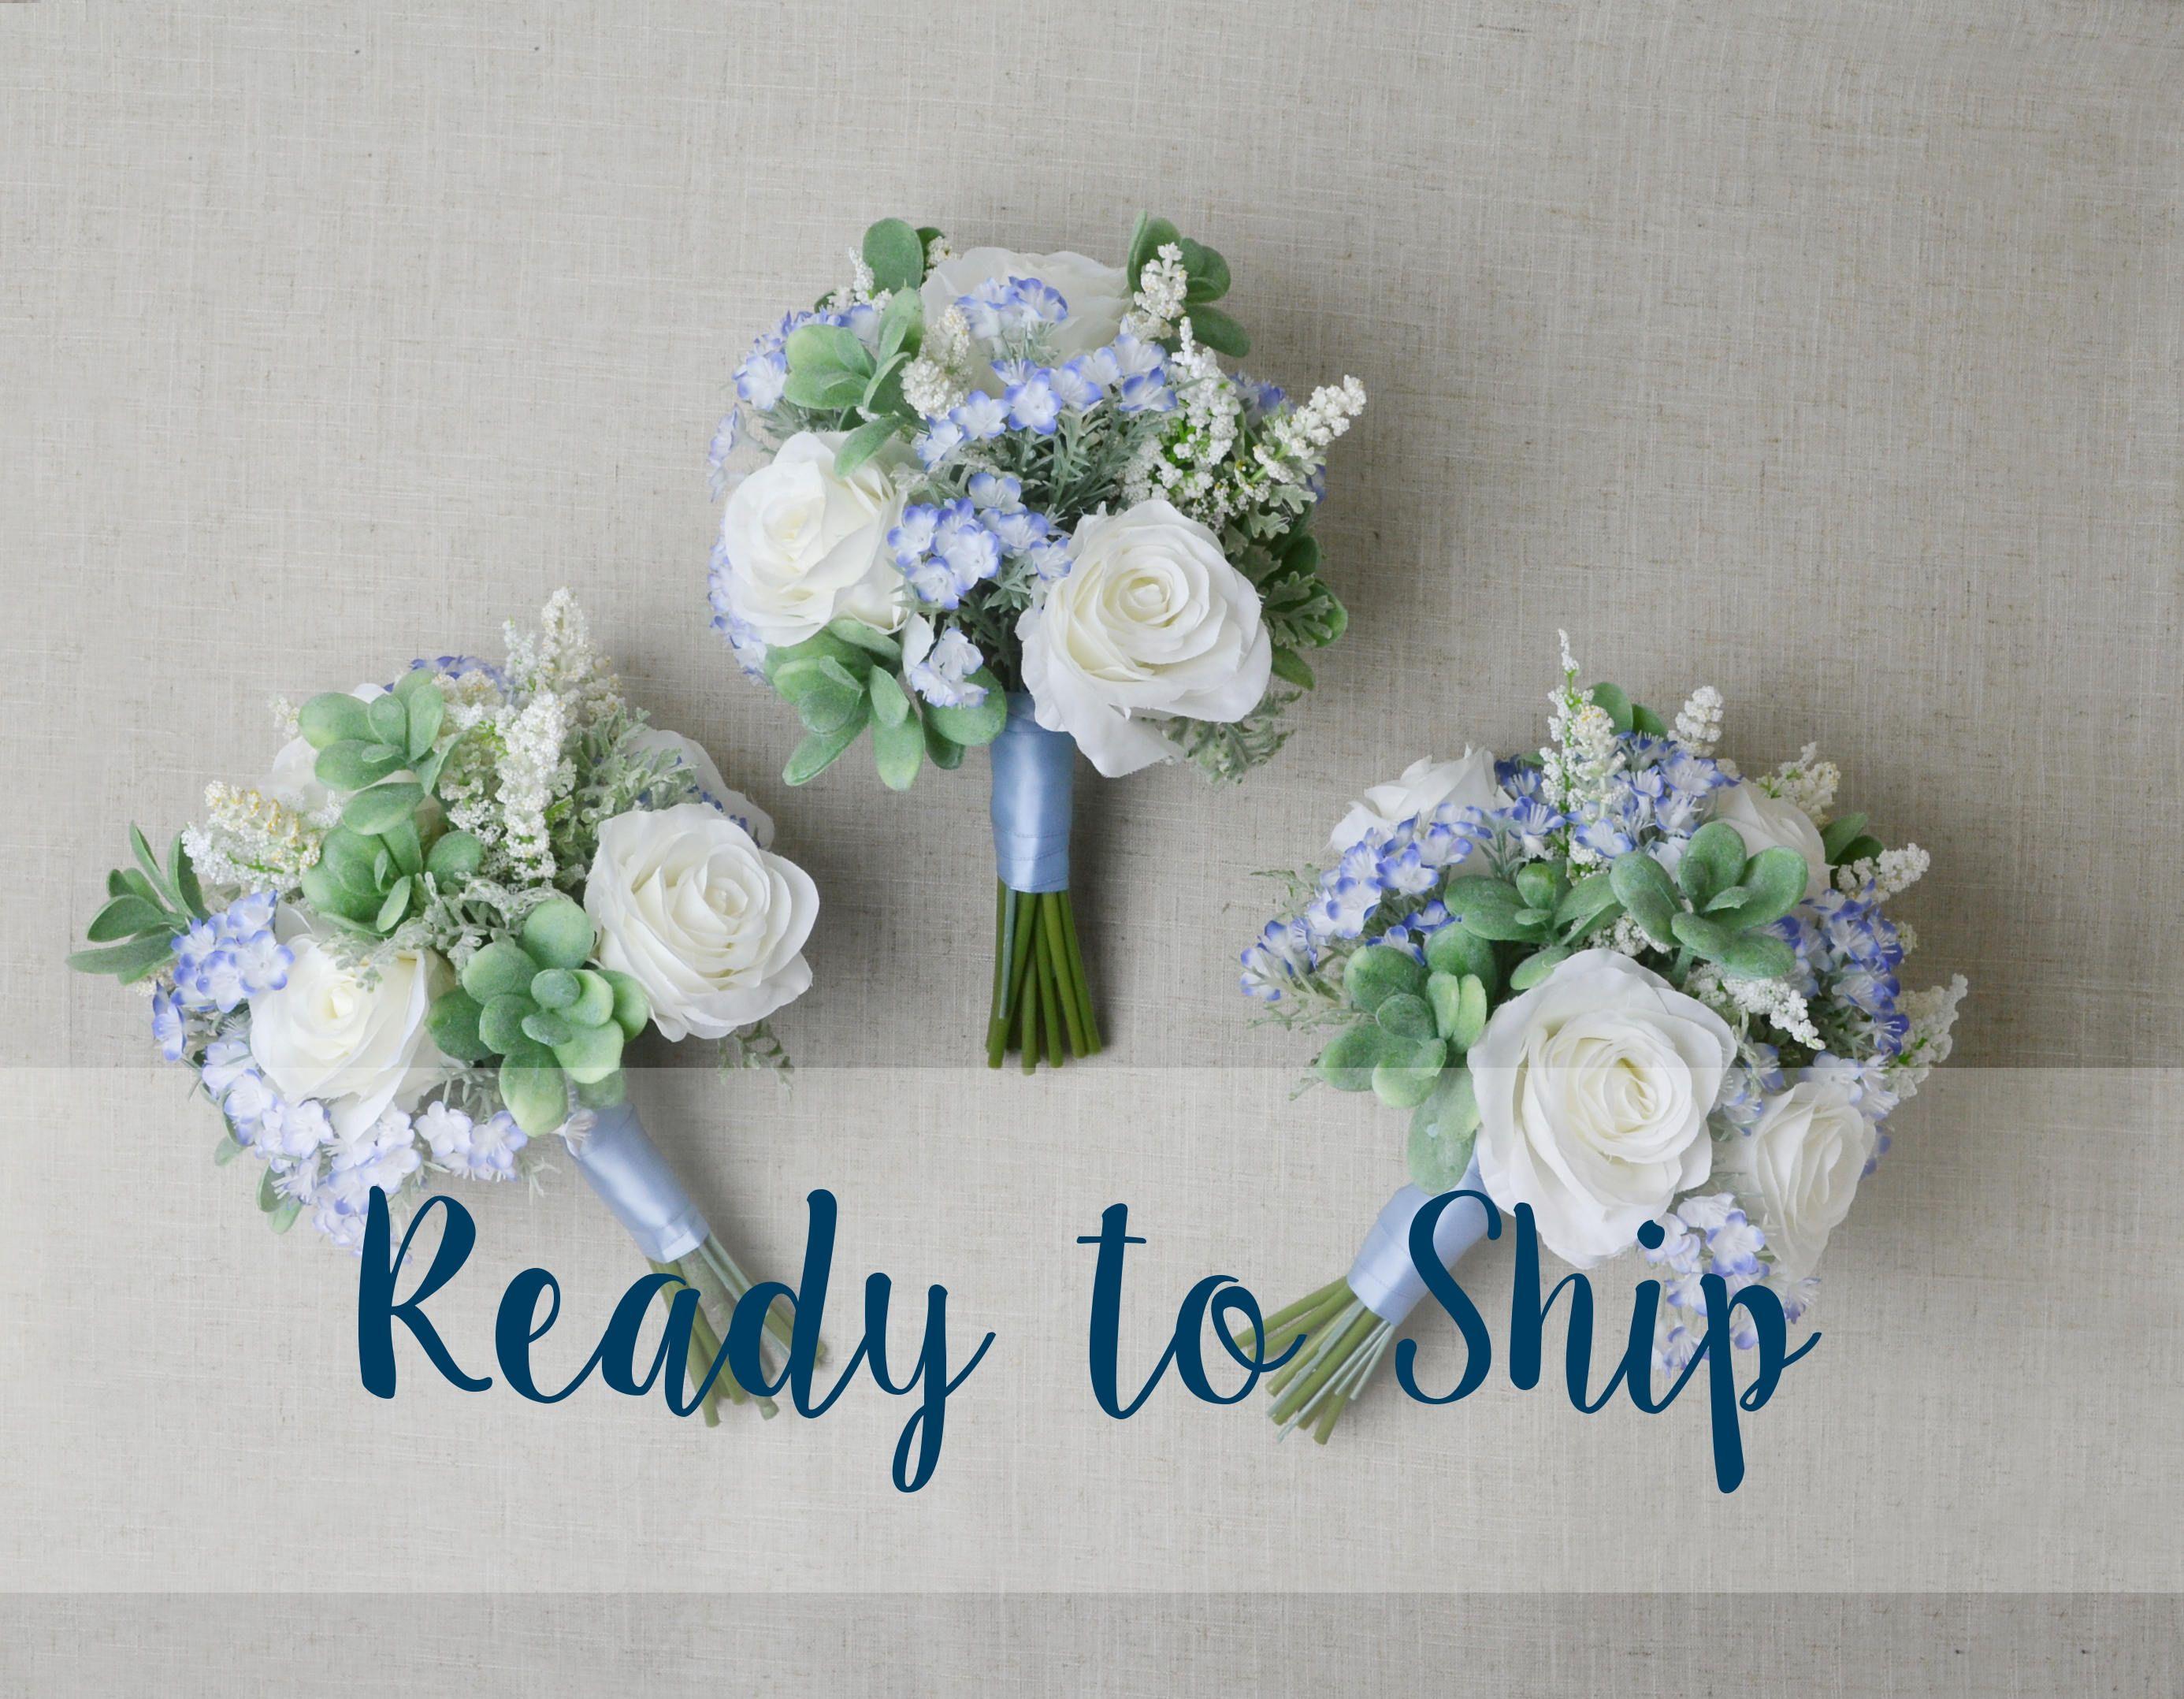 Ready to ship set of 3 bridesmaid bouquet succulent bouquet ready to ship set of 3 bridesmaid bouquet succulent bouquet wedding bouquet silk flower izmirmasajfo